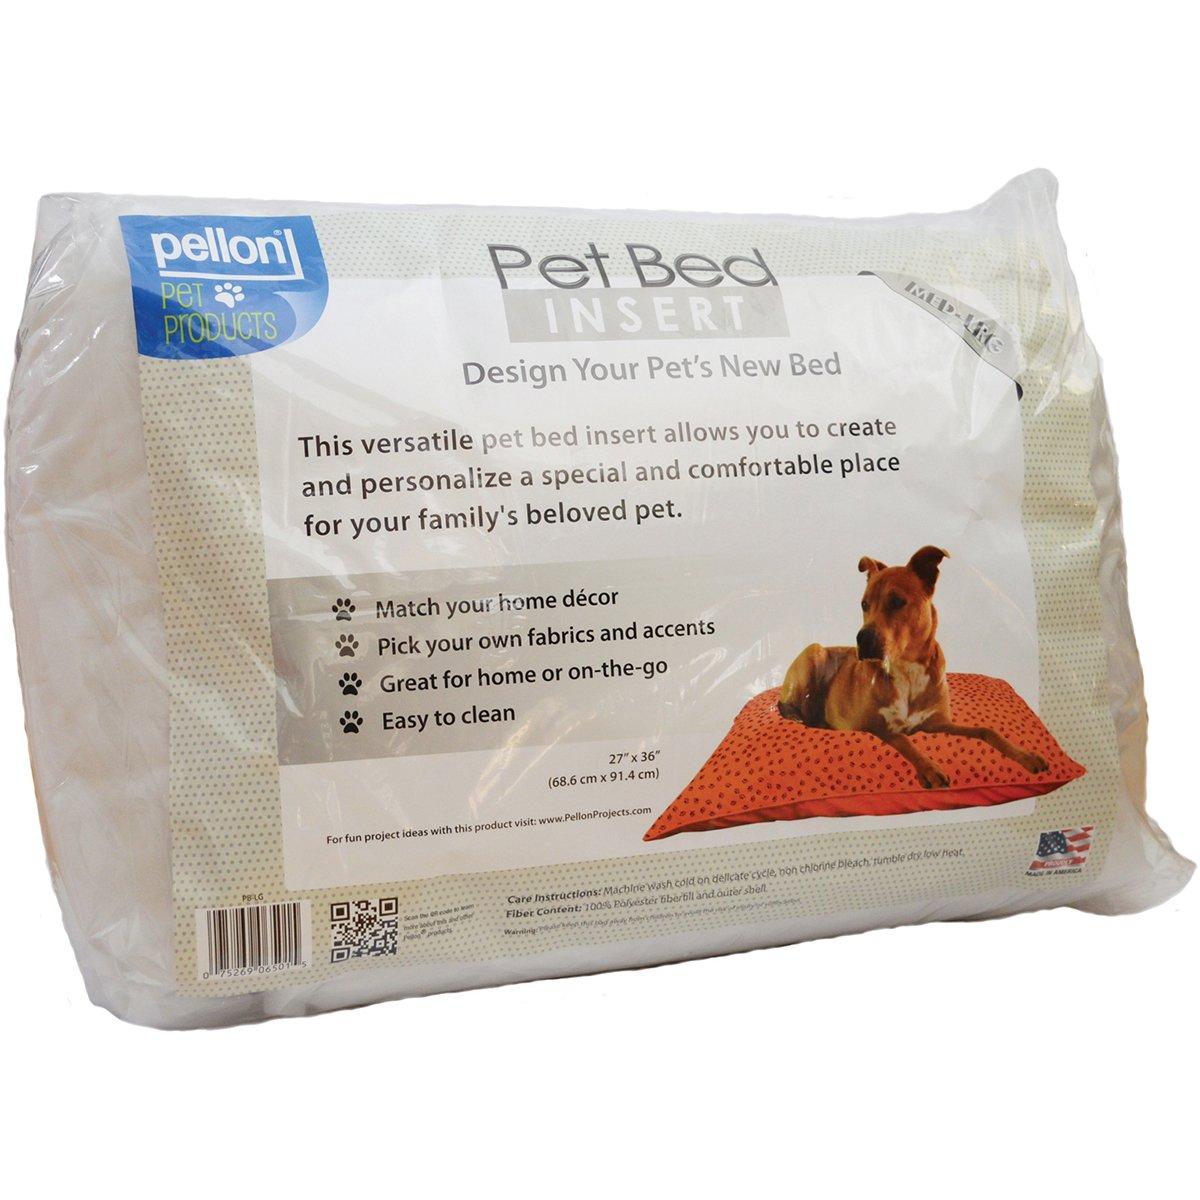 Pet Bed Insert -27x36